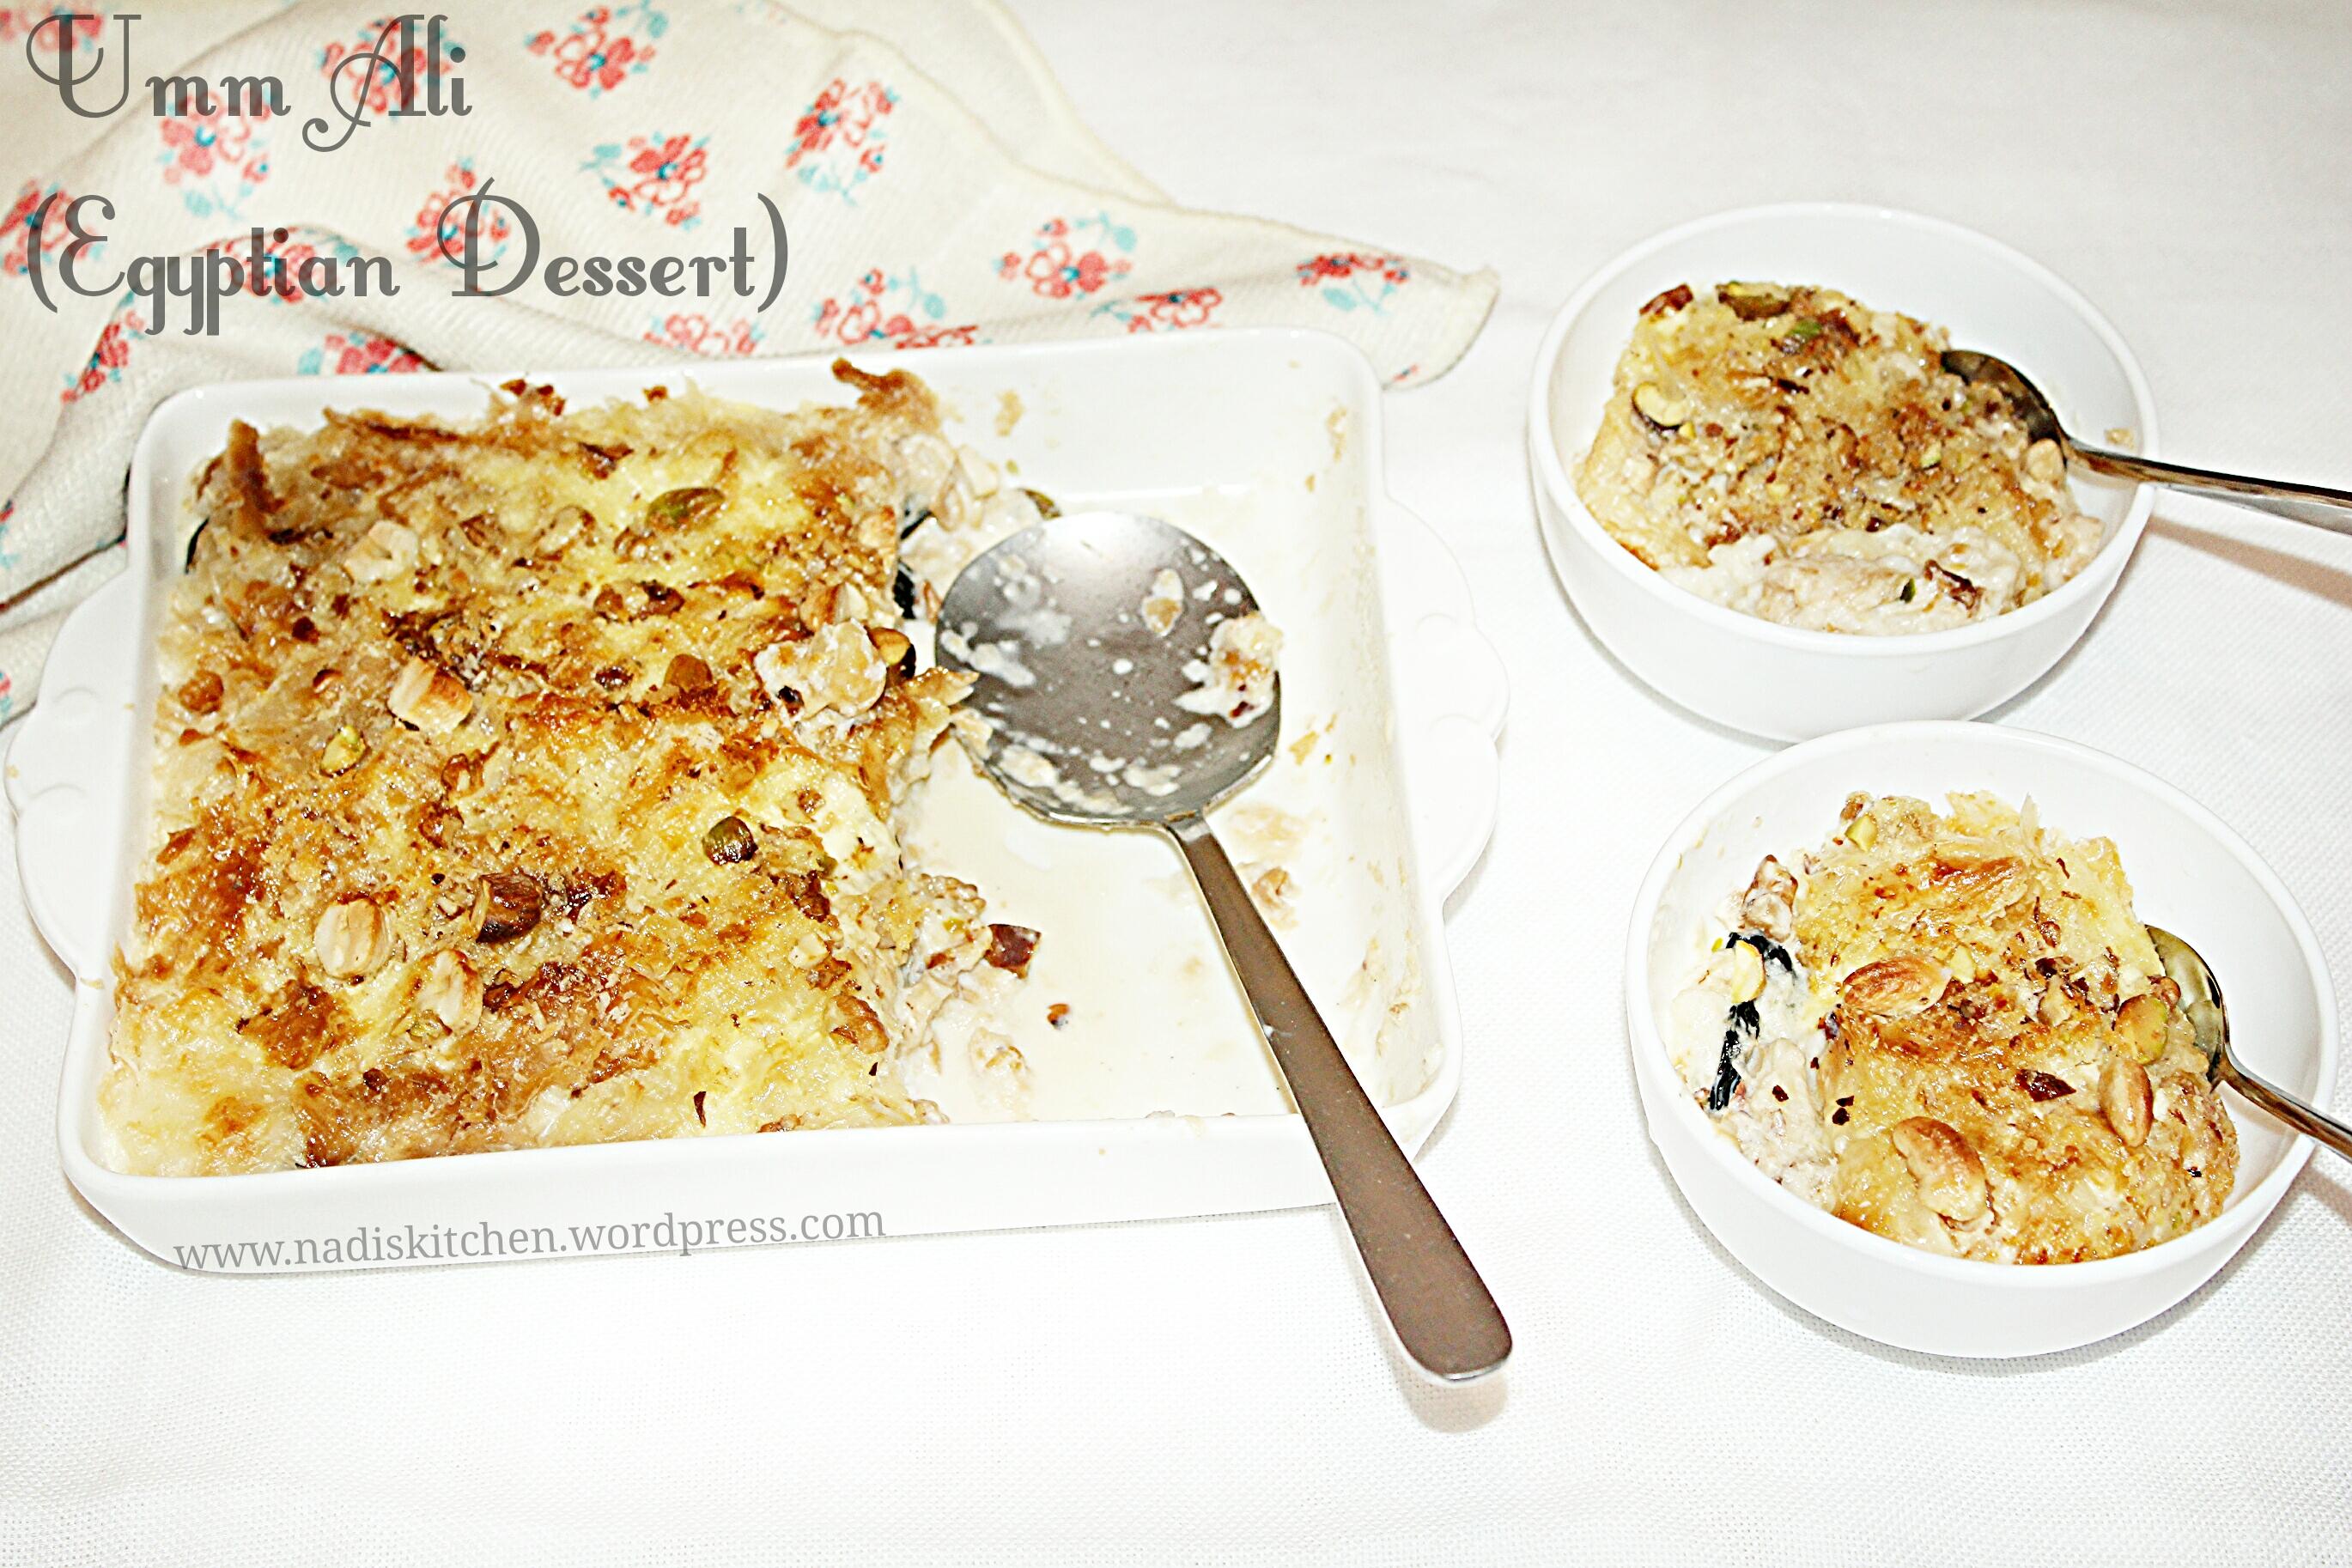 Umm ali (Egyptia dessert with puff pastry)